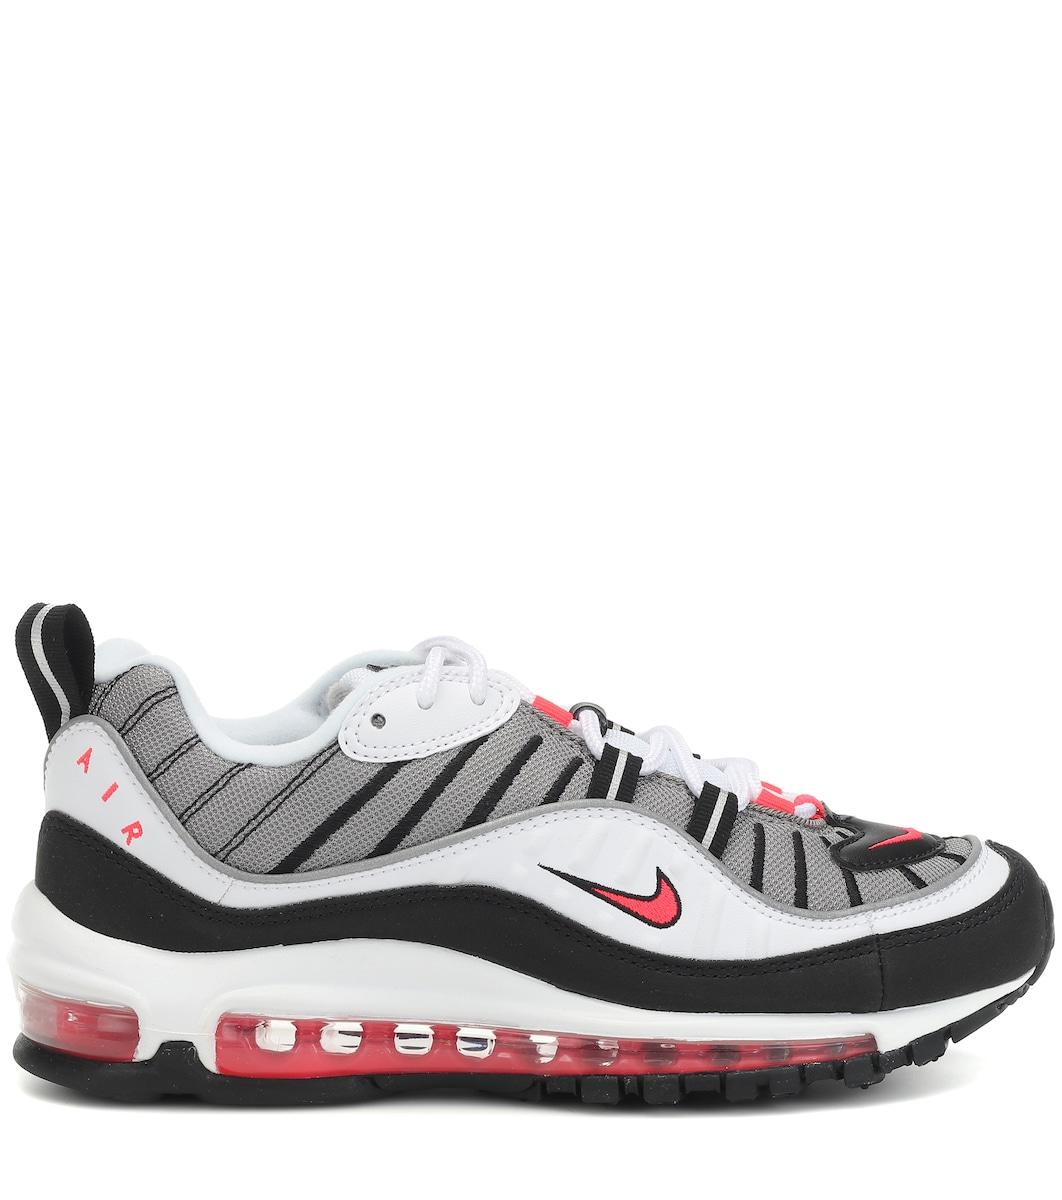 681e0e19 Nike - Air Max 98 sneakers | Mytheresa